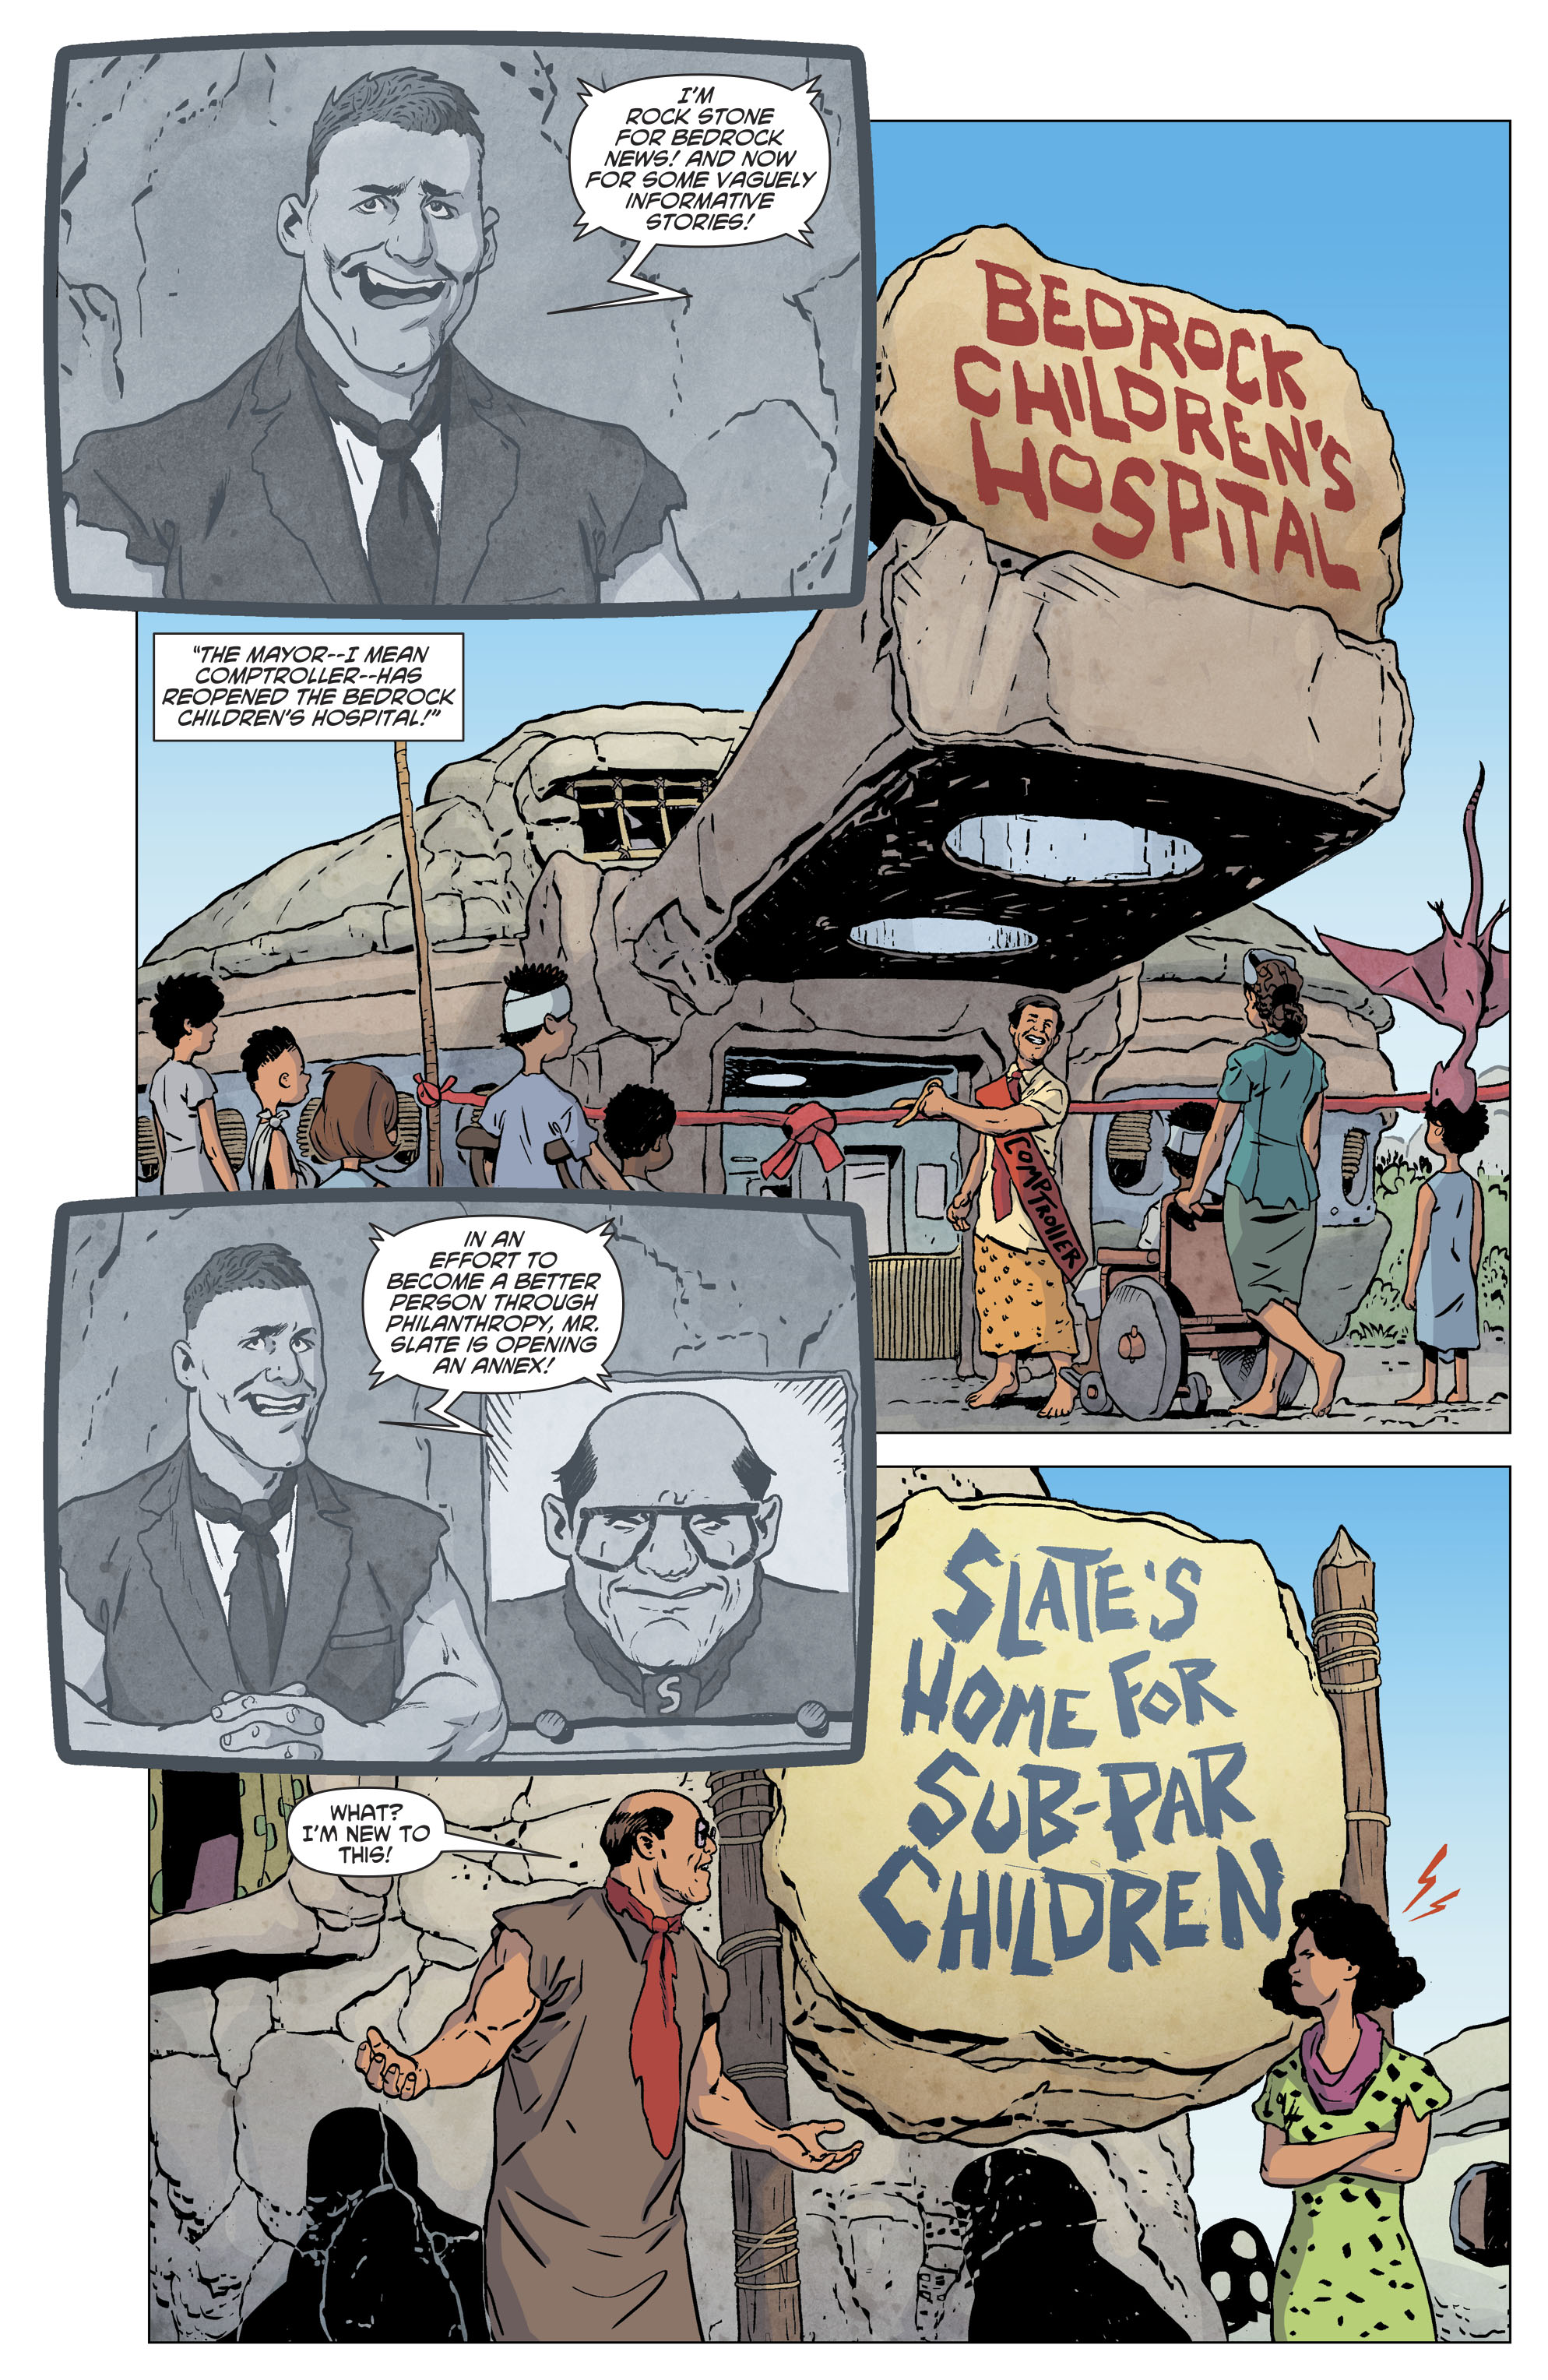 Read online The Flintstones comic -  Issue #12 - 7